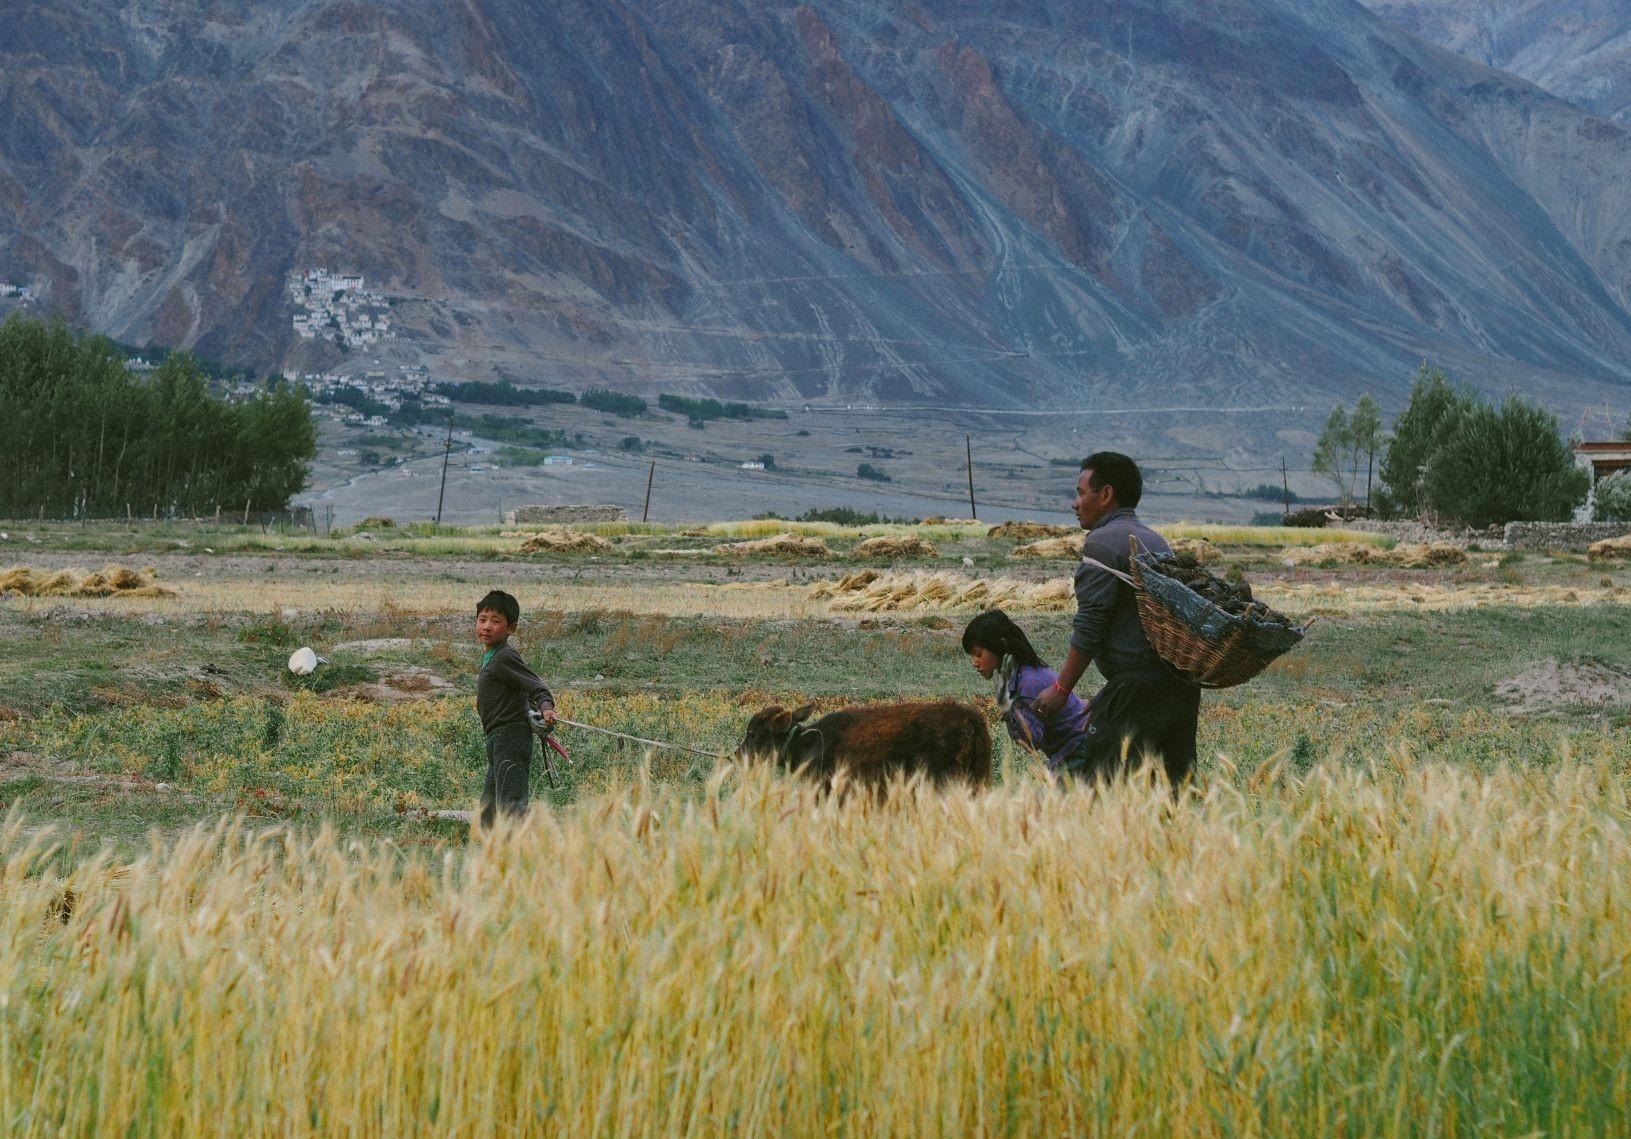 Duong den Ladakh - hanh trinh danh cho nhung doi chan khong biet moi hinh anh 44